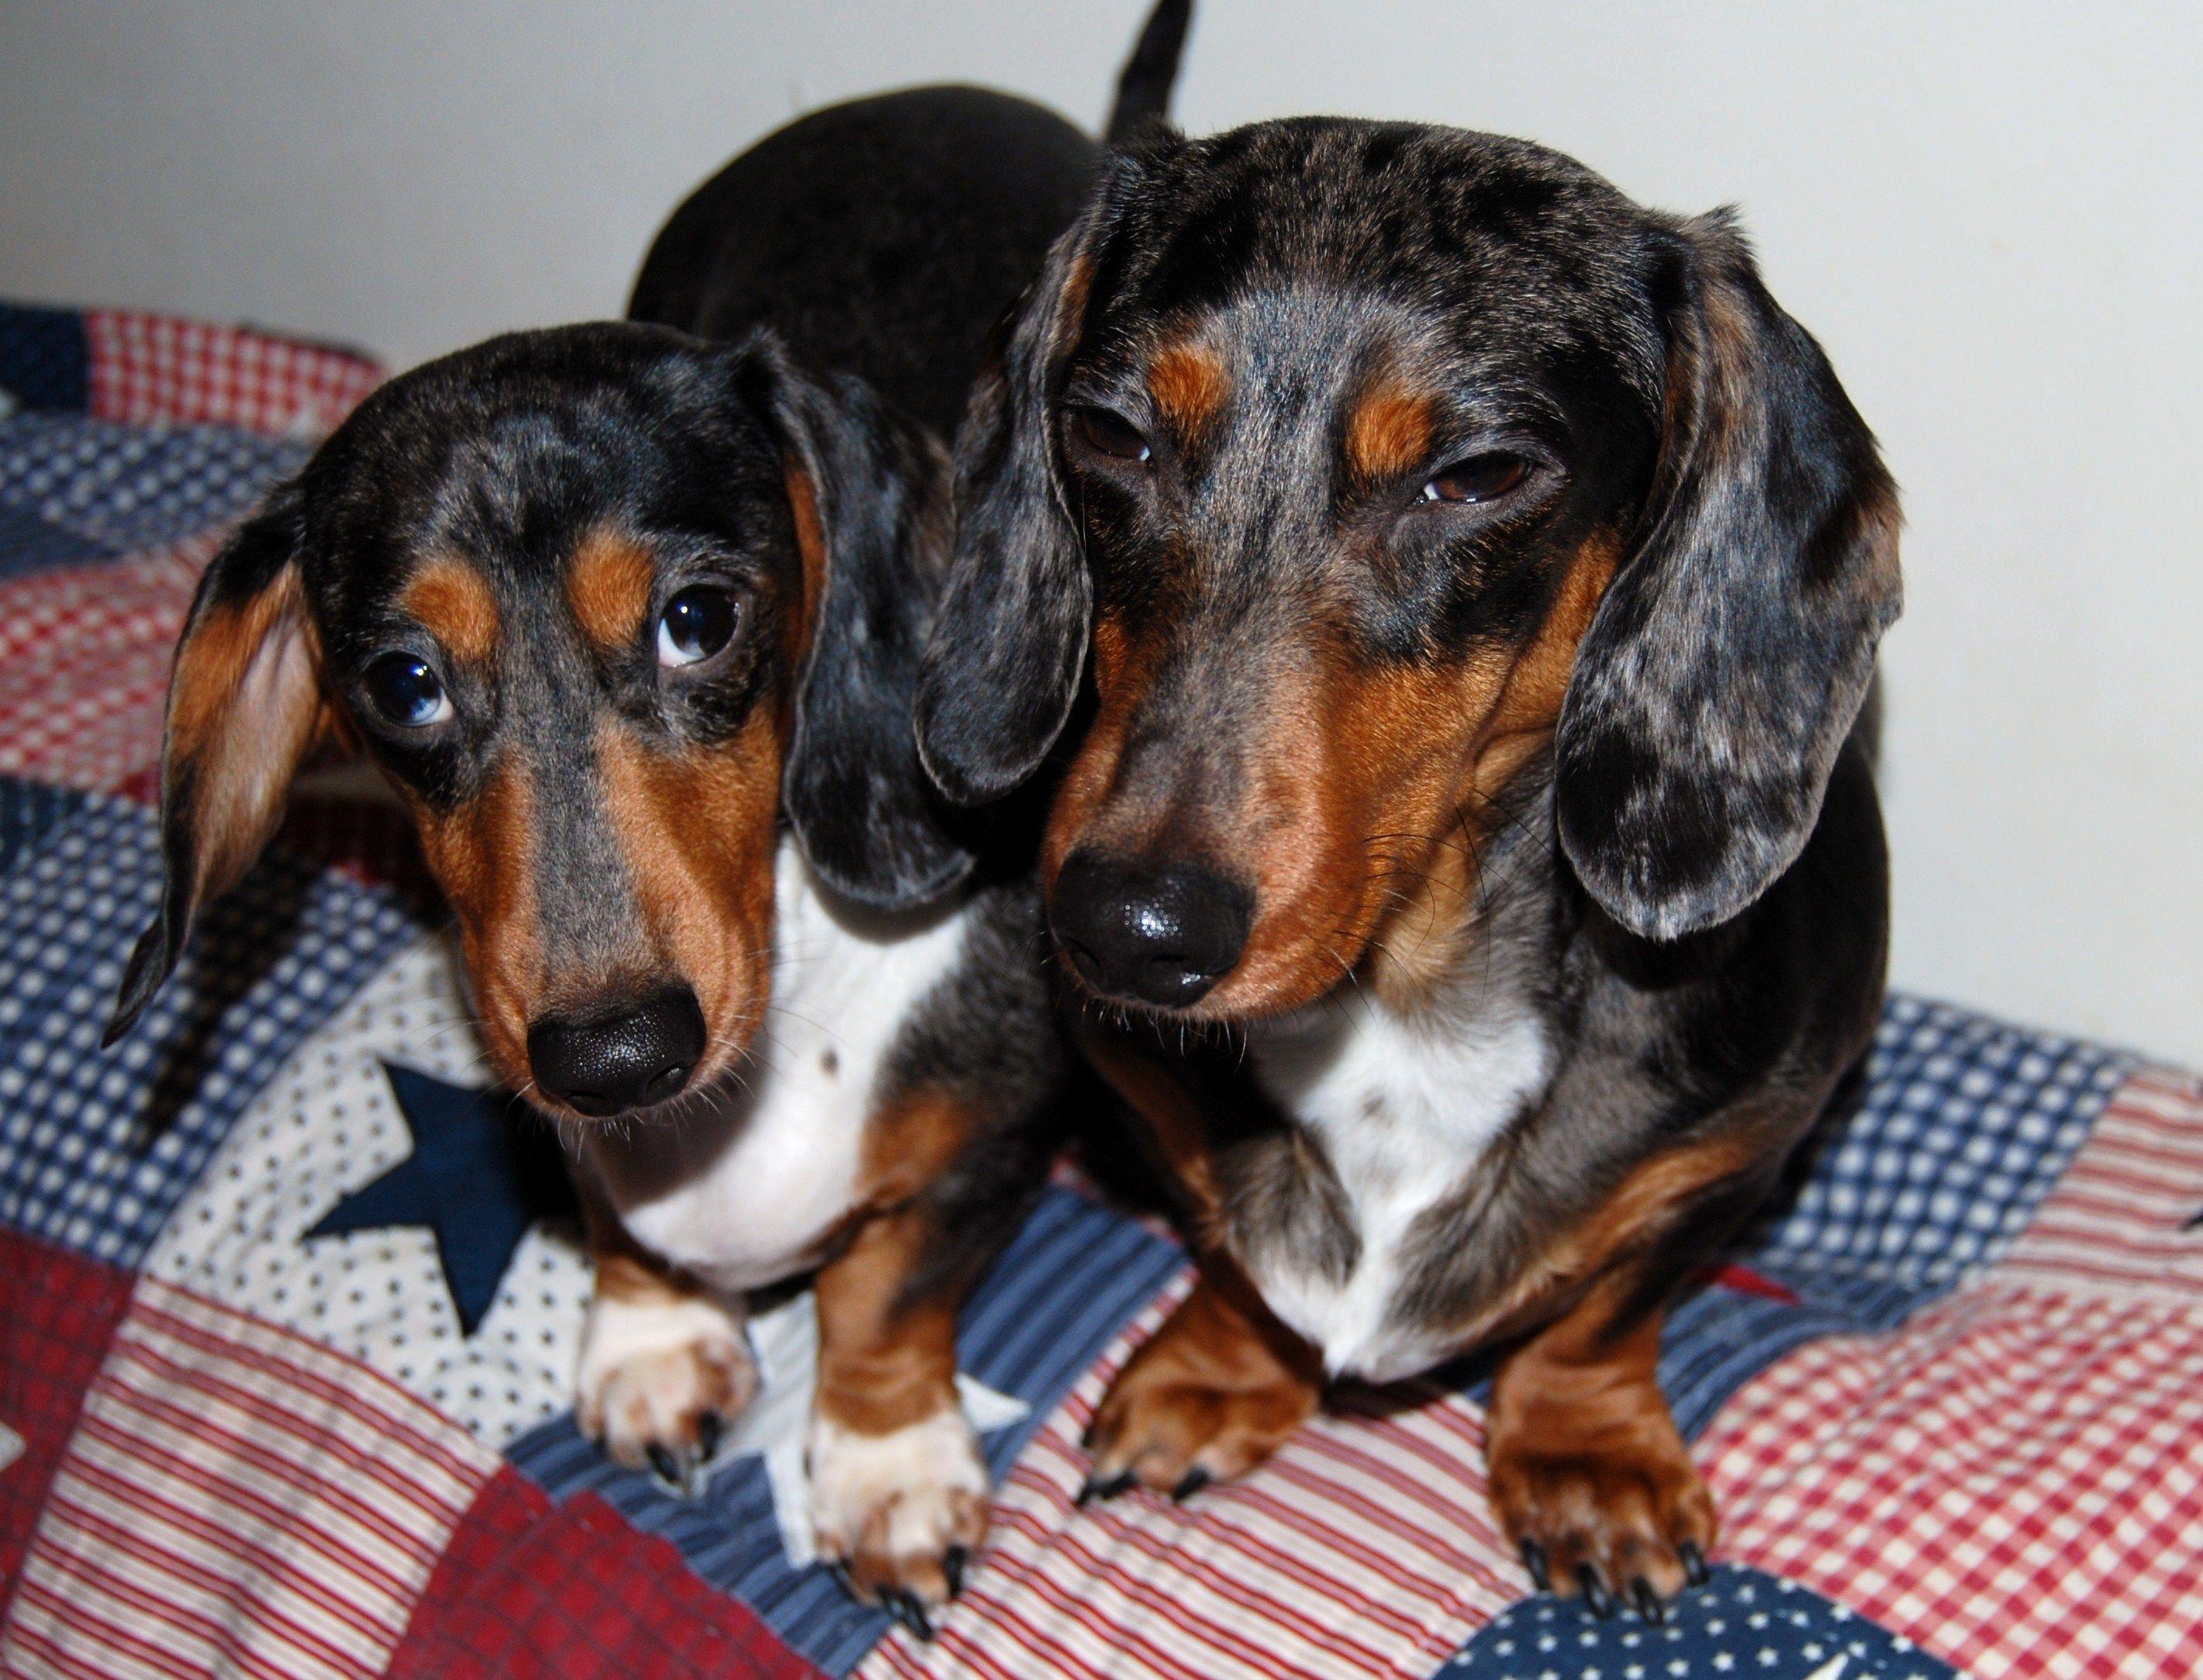 Dappled dachshunds